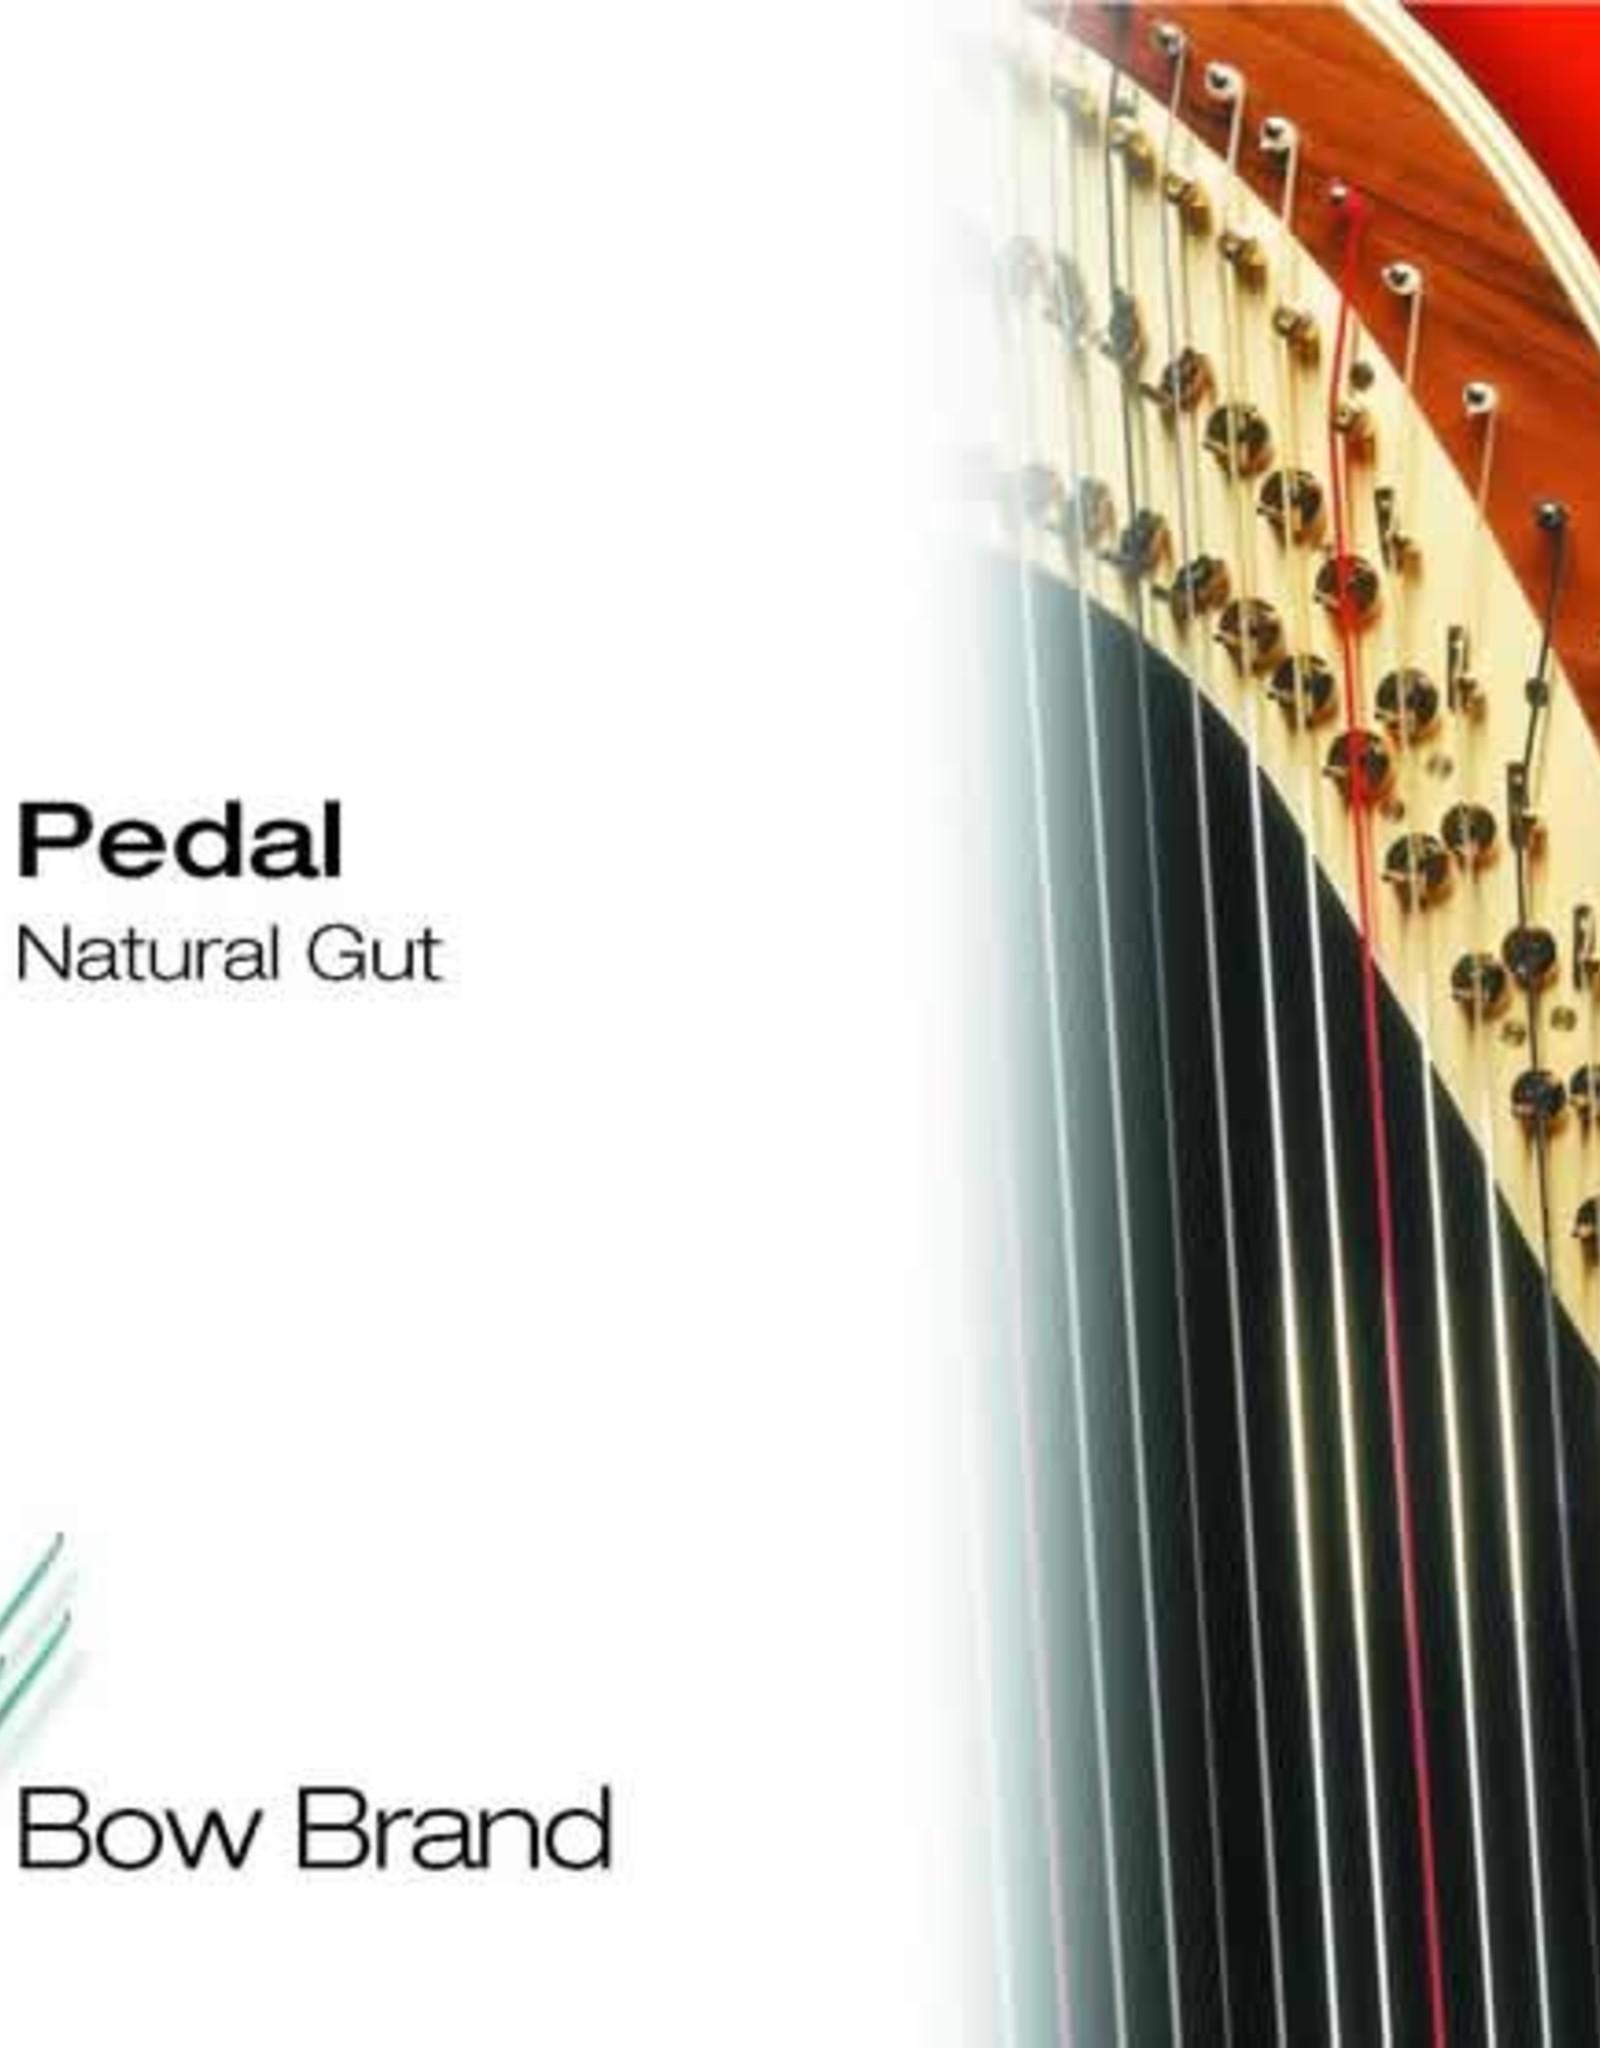 BOW BRAND  pedaal darm - pedal STD GUT 3/1 do